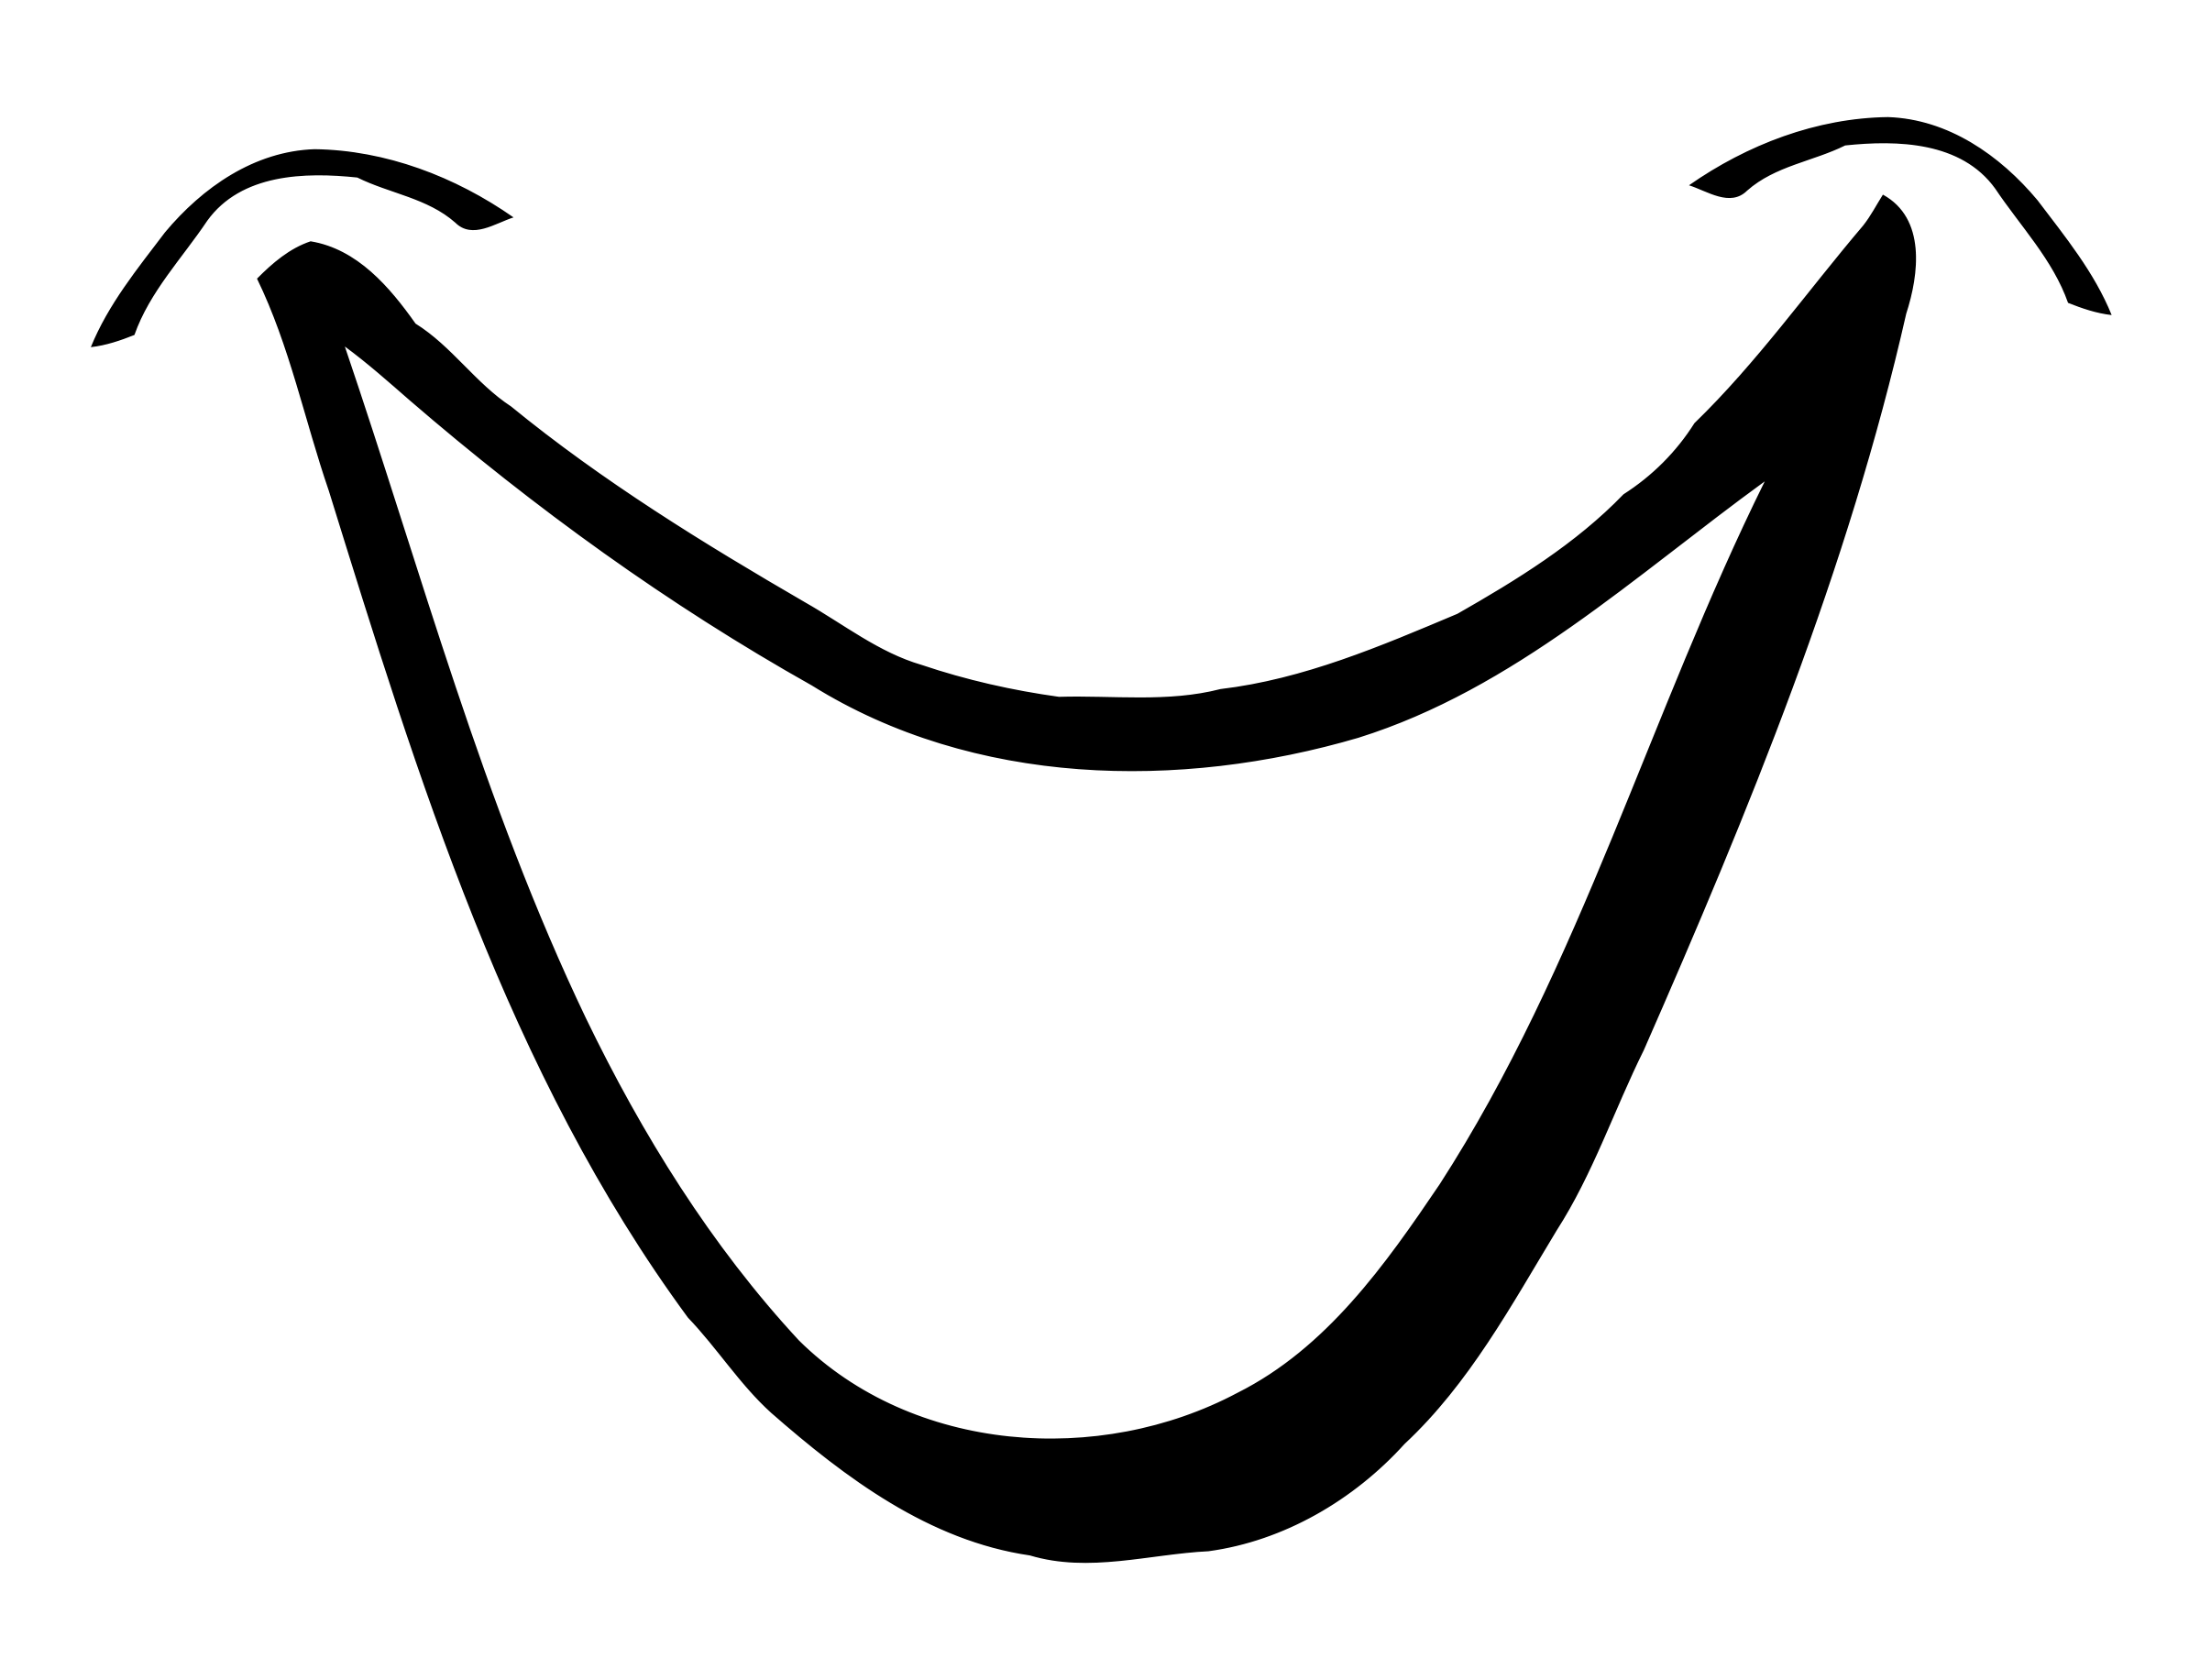 Smile Clipart Black And White-smile clipart black and white-14